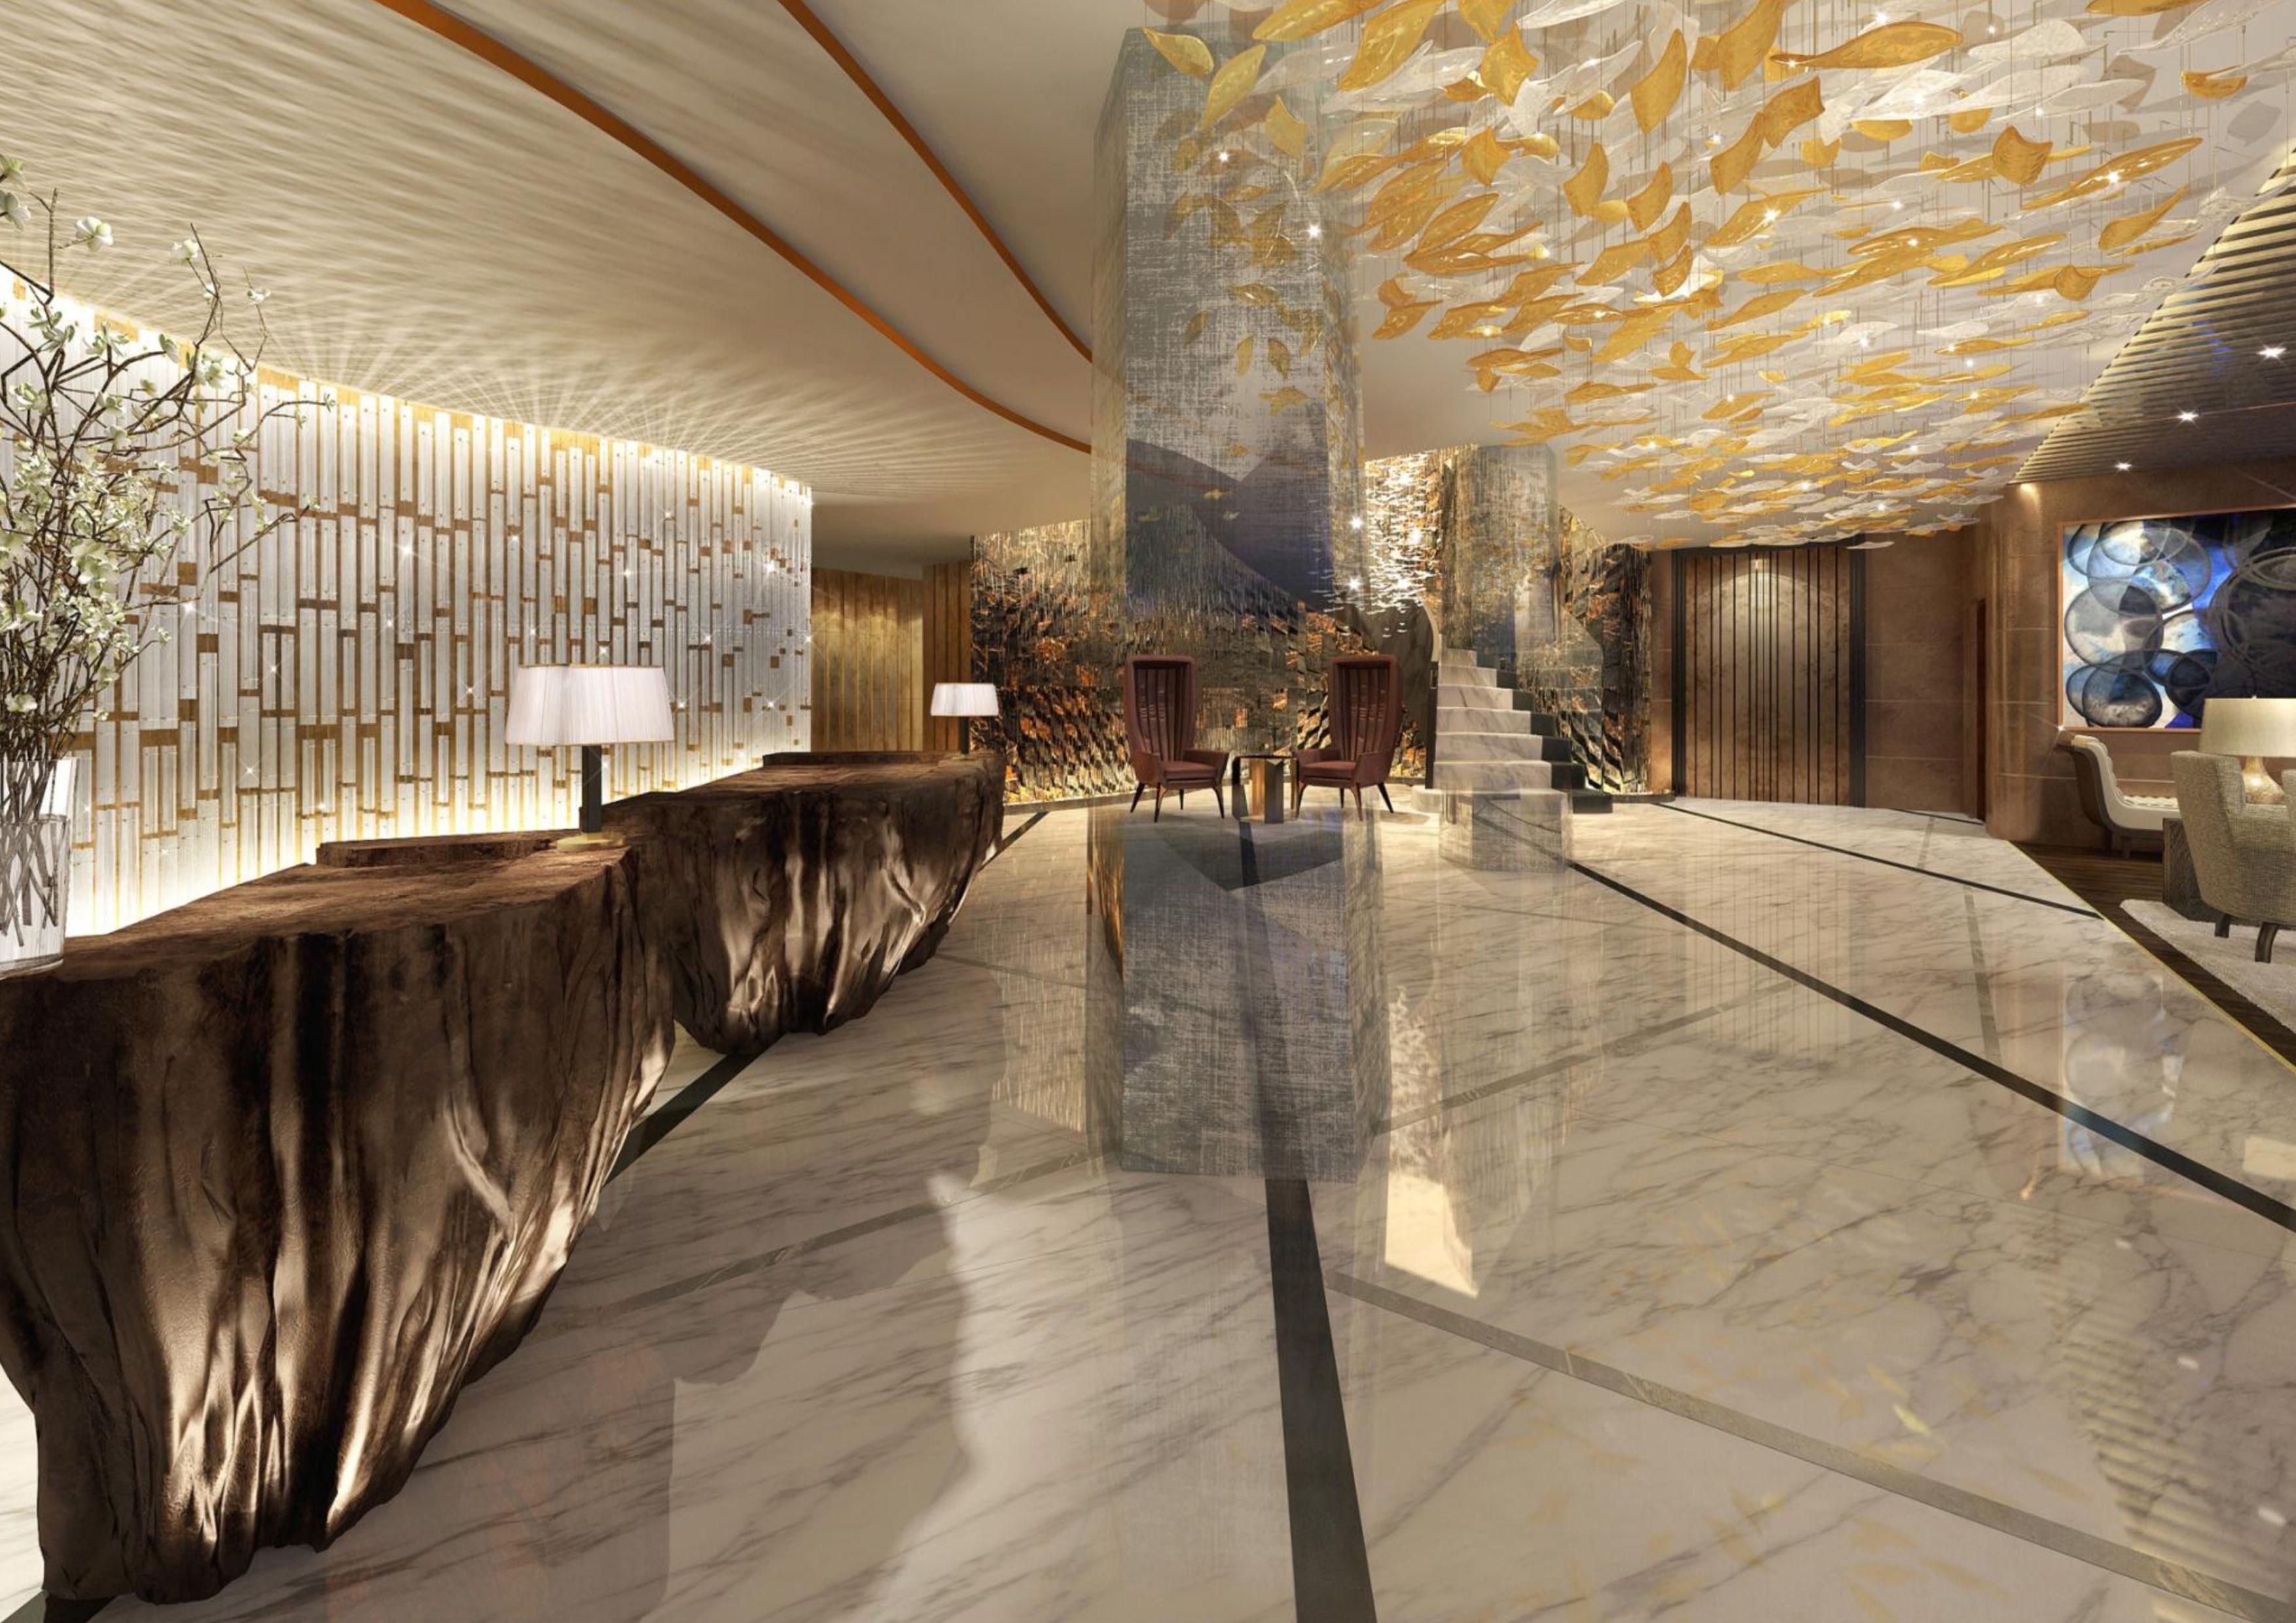 Hotel Atlantis By Giardino Zurich Switzerland Entrance Hall